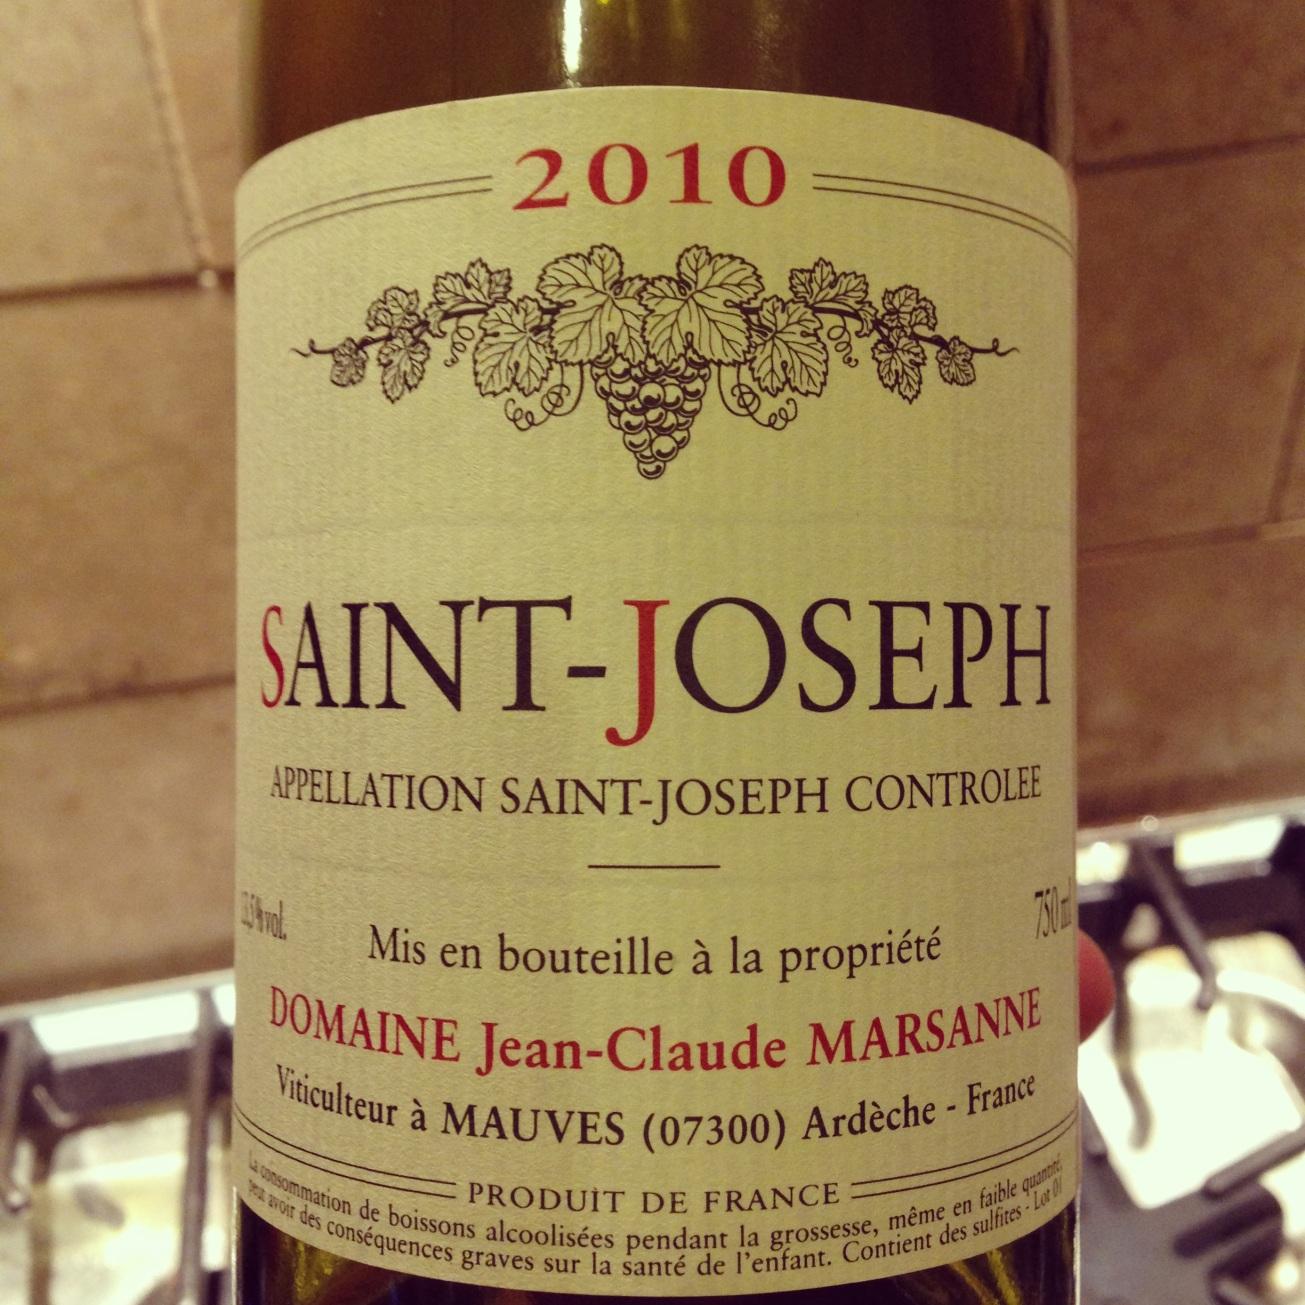 2010 Domaine Jean-Claude Marsanne St. Joseph